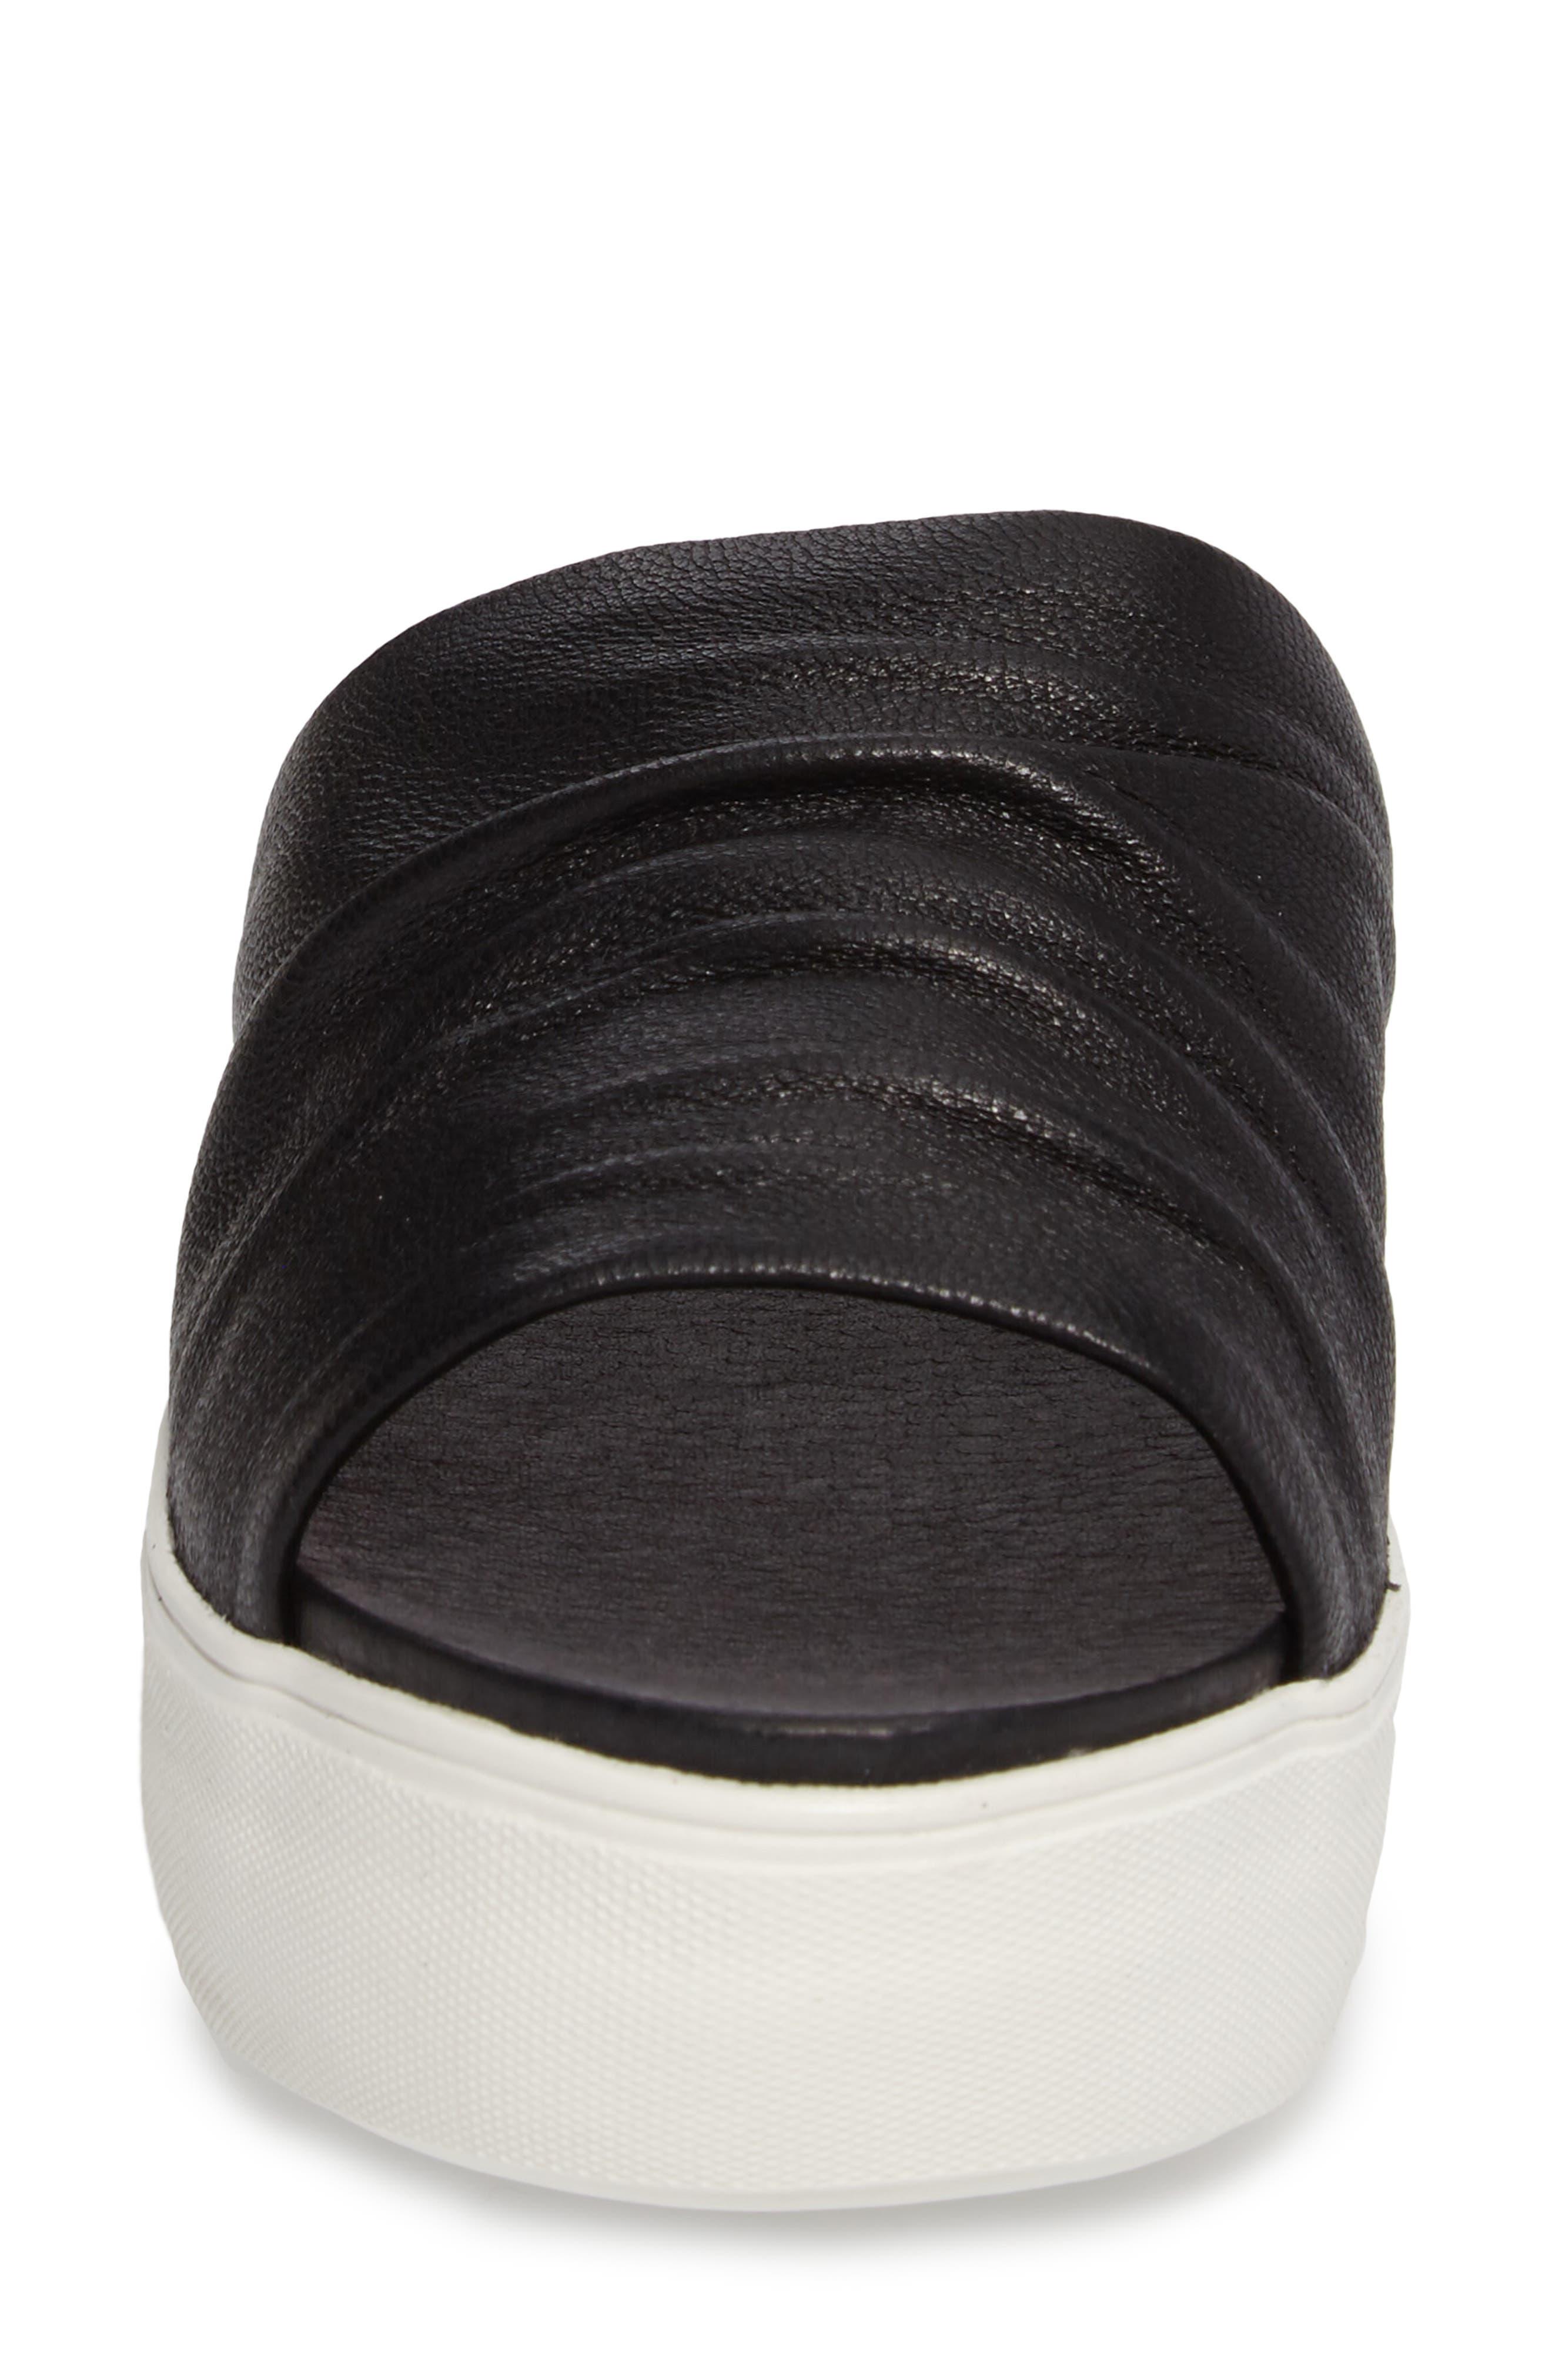 Alura Platform Slide Sandal,                             Alternate thumbnail 4, color,                             Black Leather